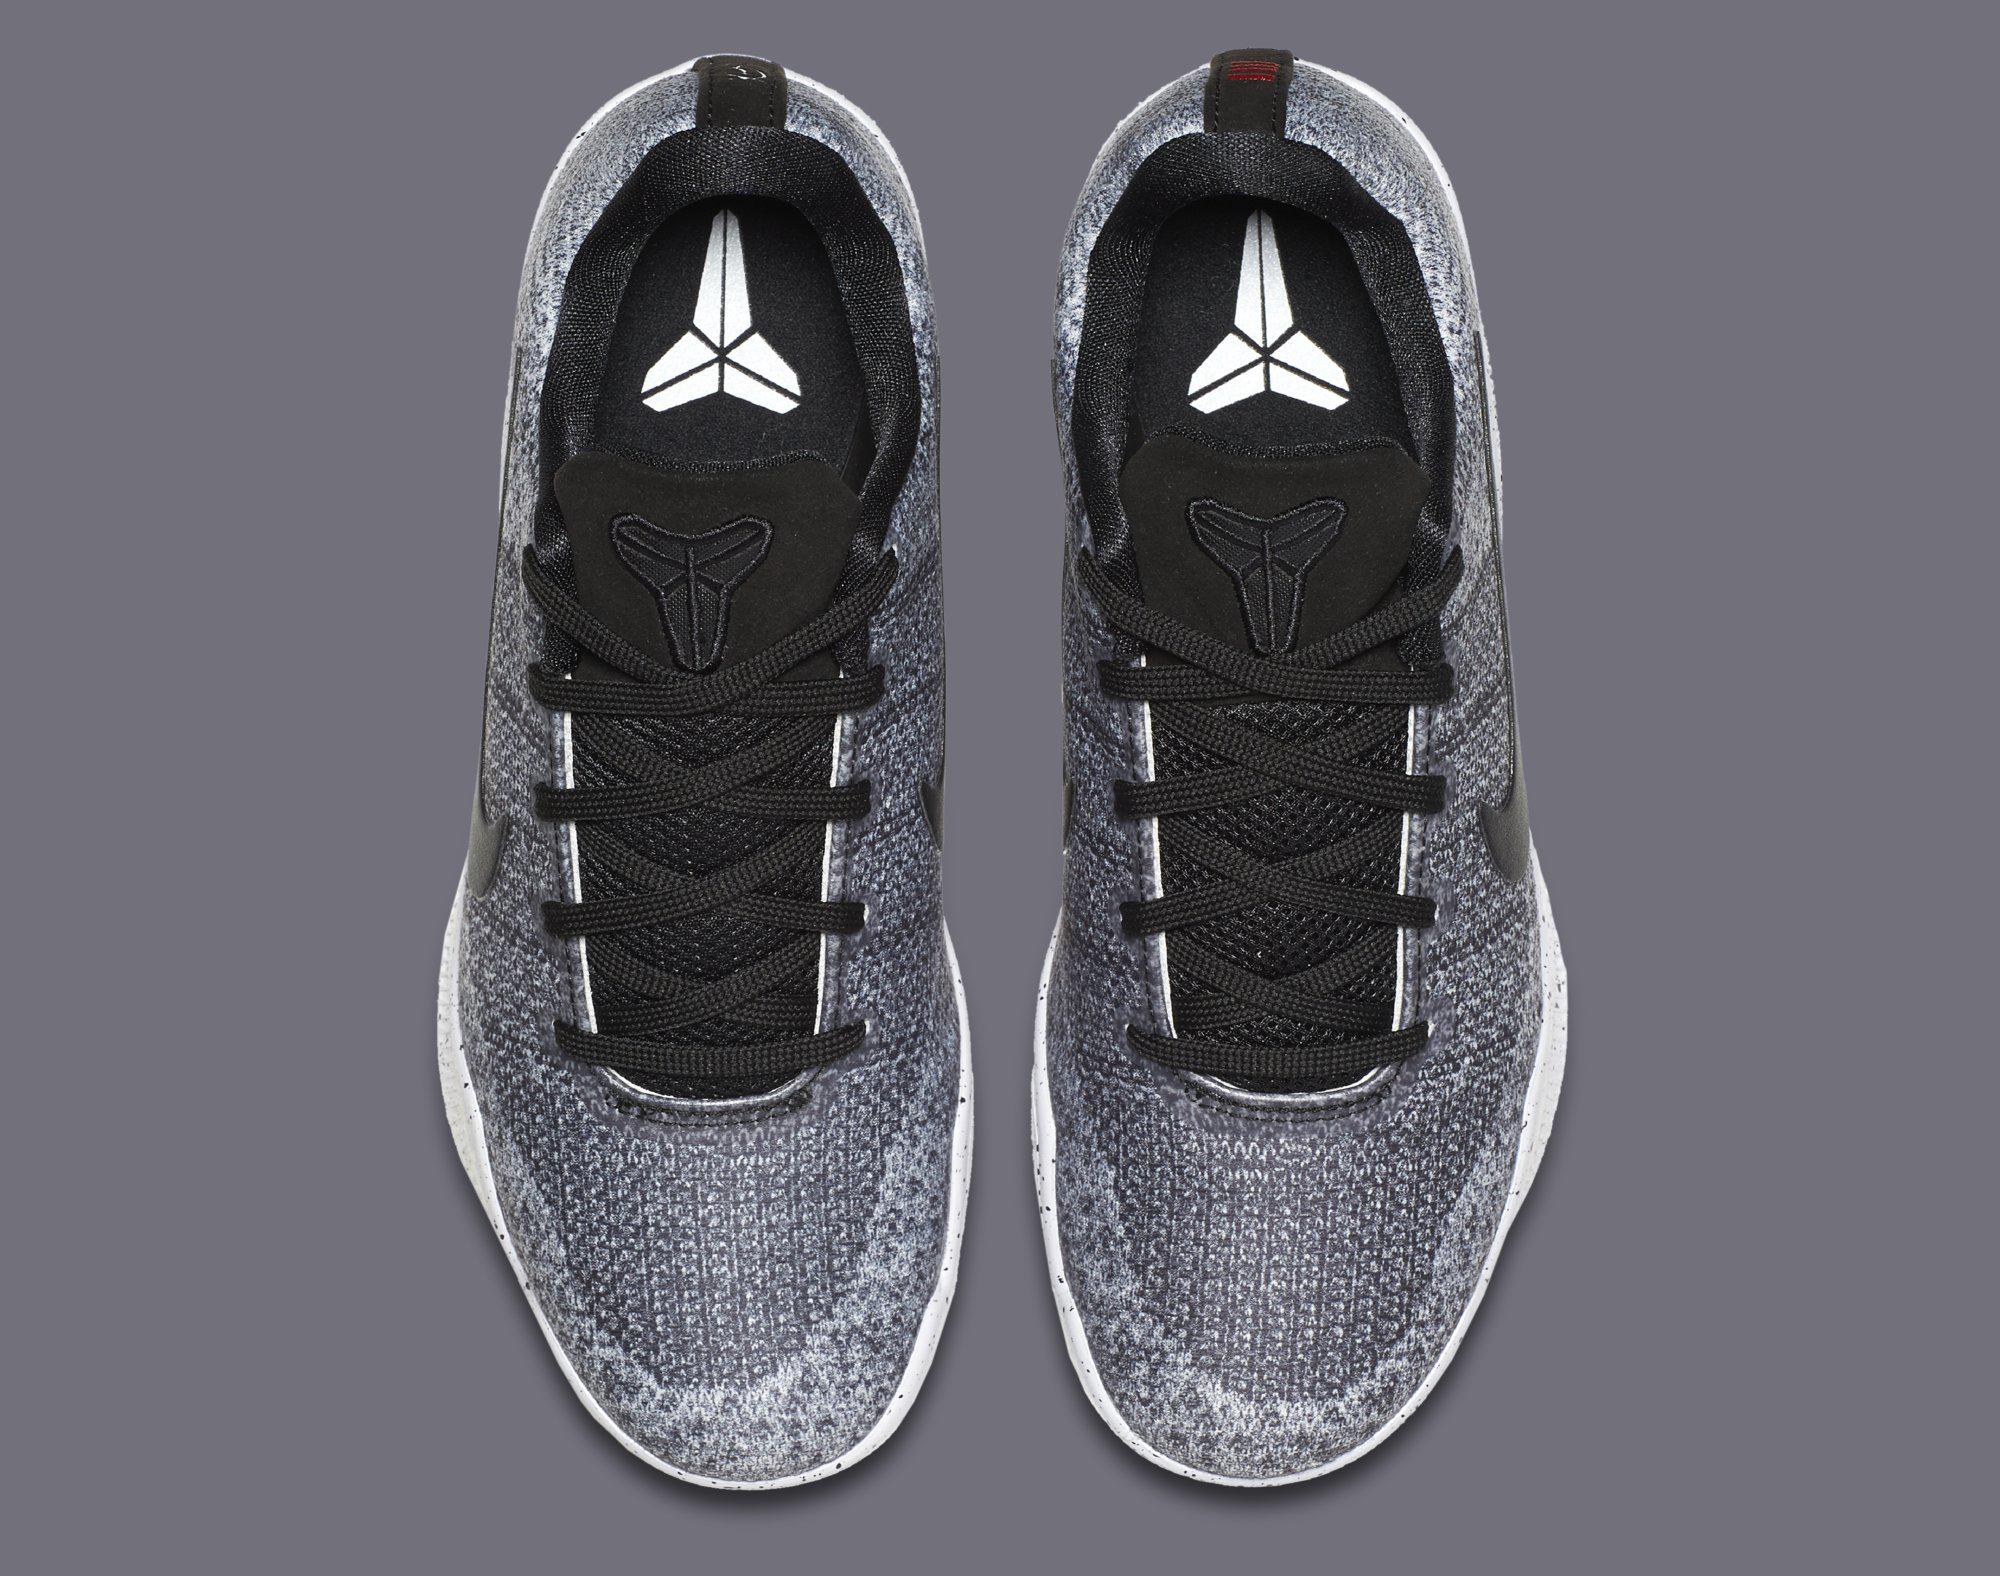 new concept d20cc 2fc5d Nike Kobe 11 Oreo Kids 822945-100 Top